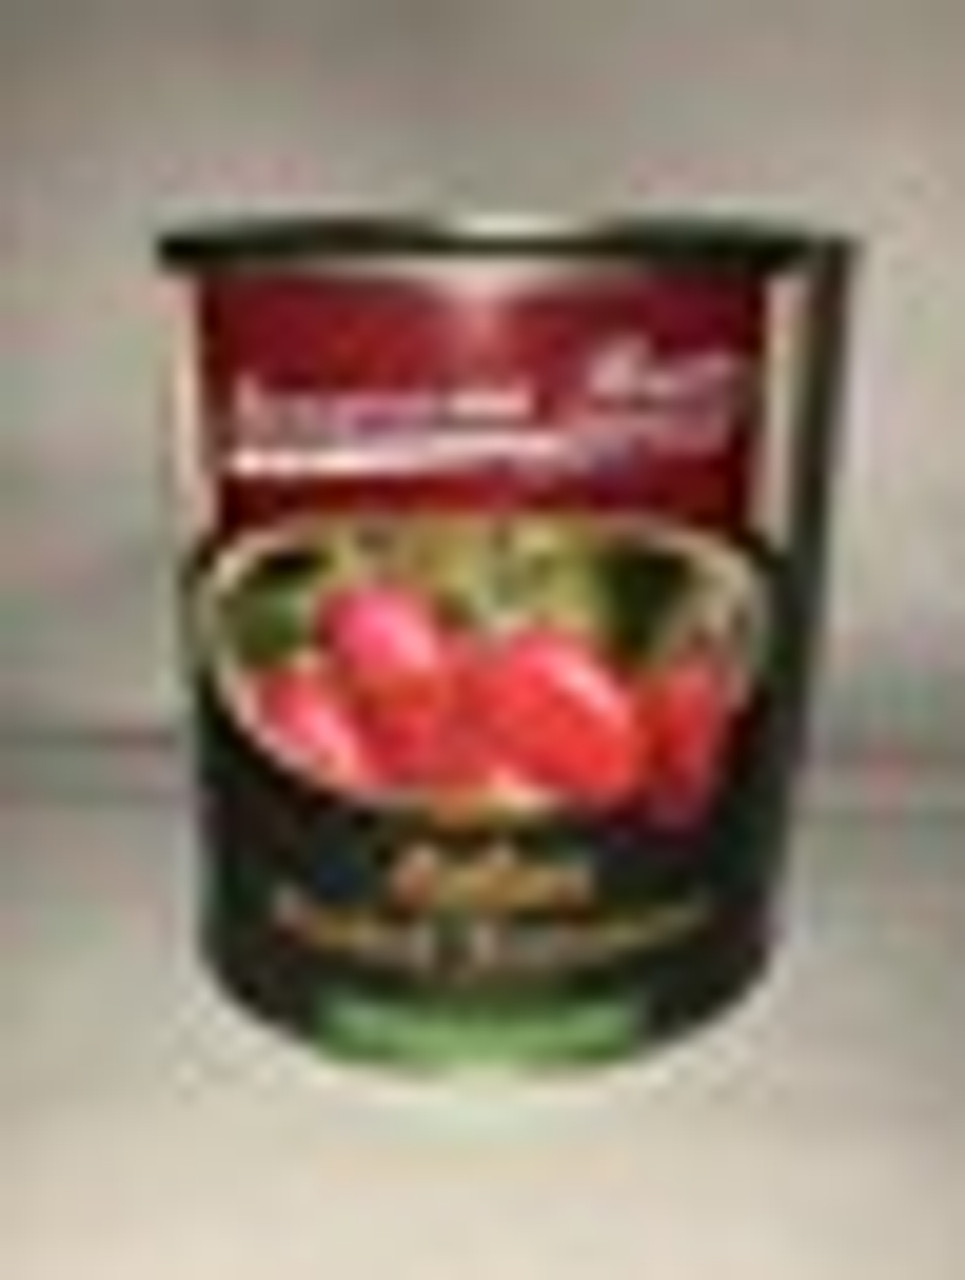 Iavarone Imported Italian Peeled Tomatoes